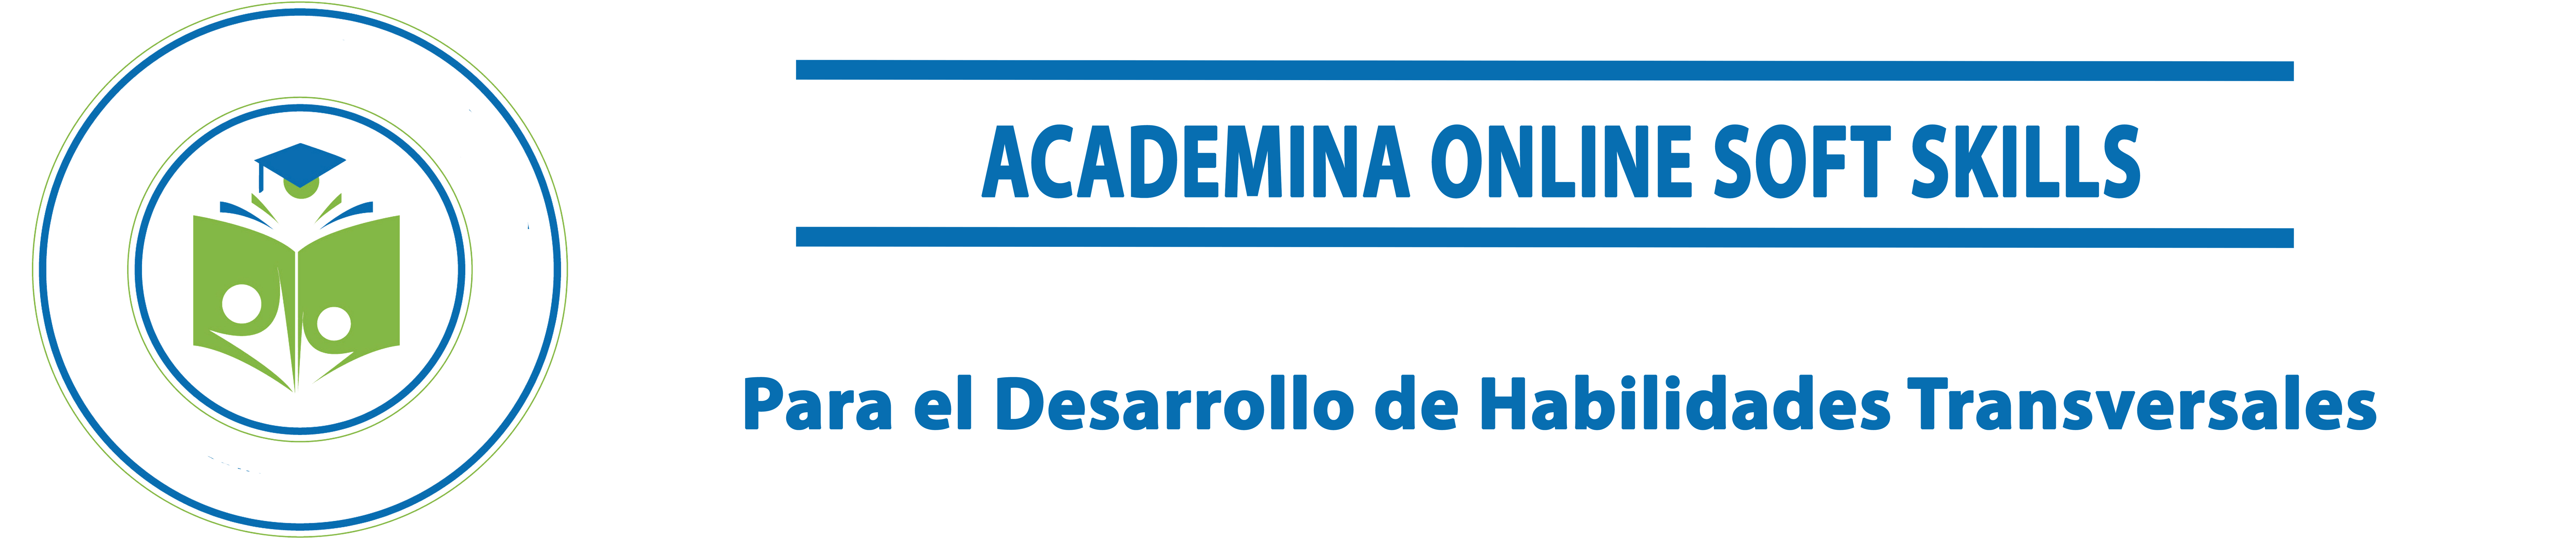 Academia Soft Skills